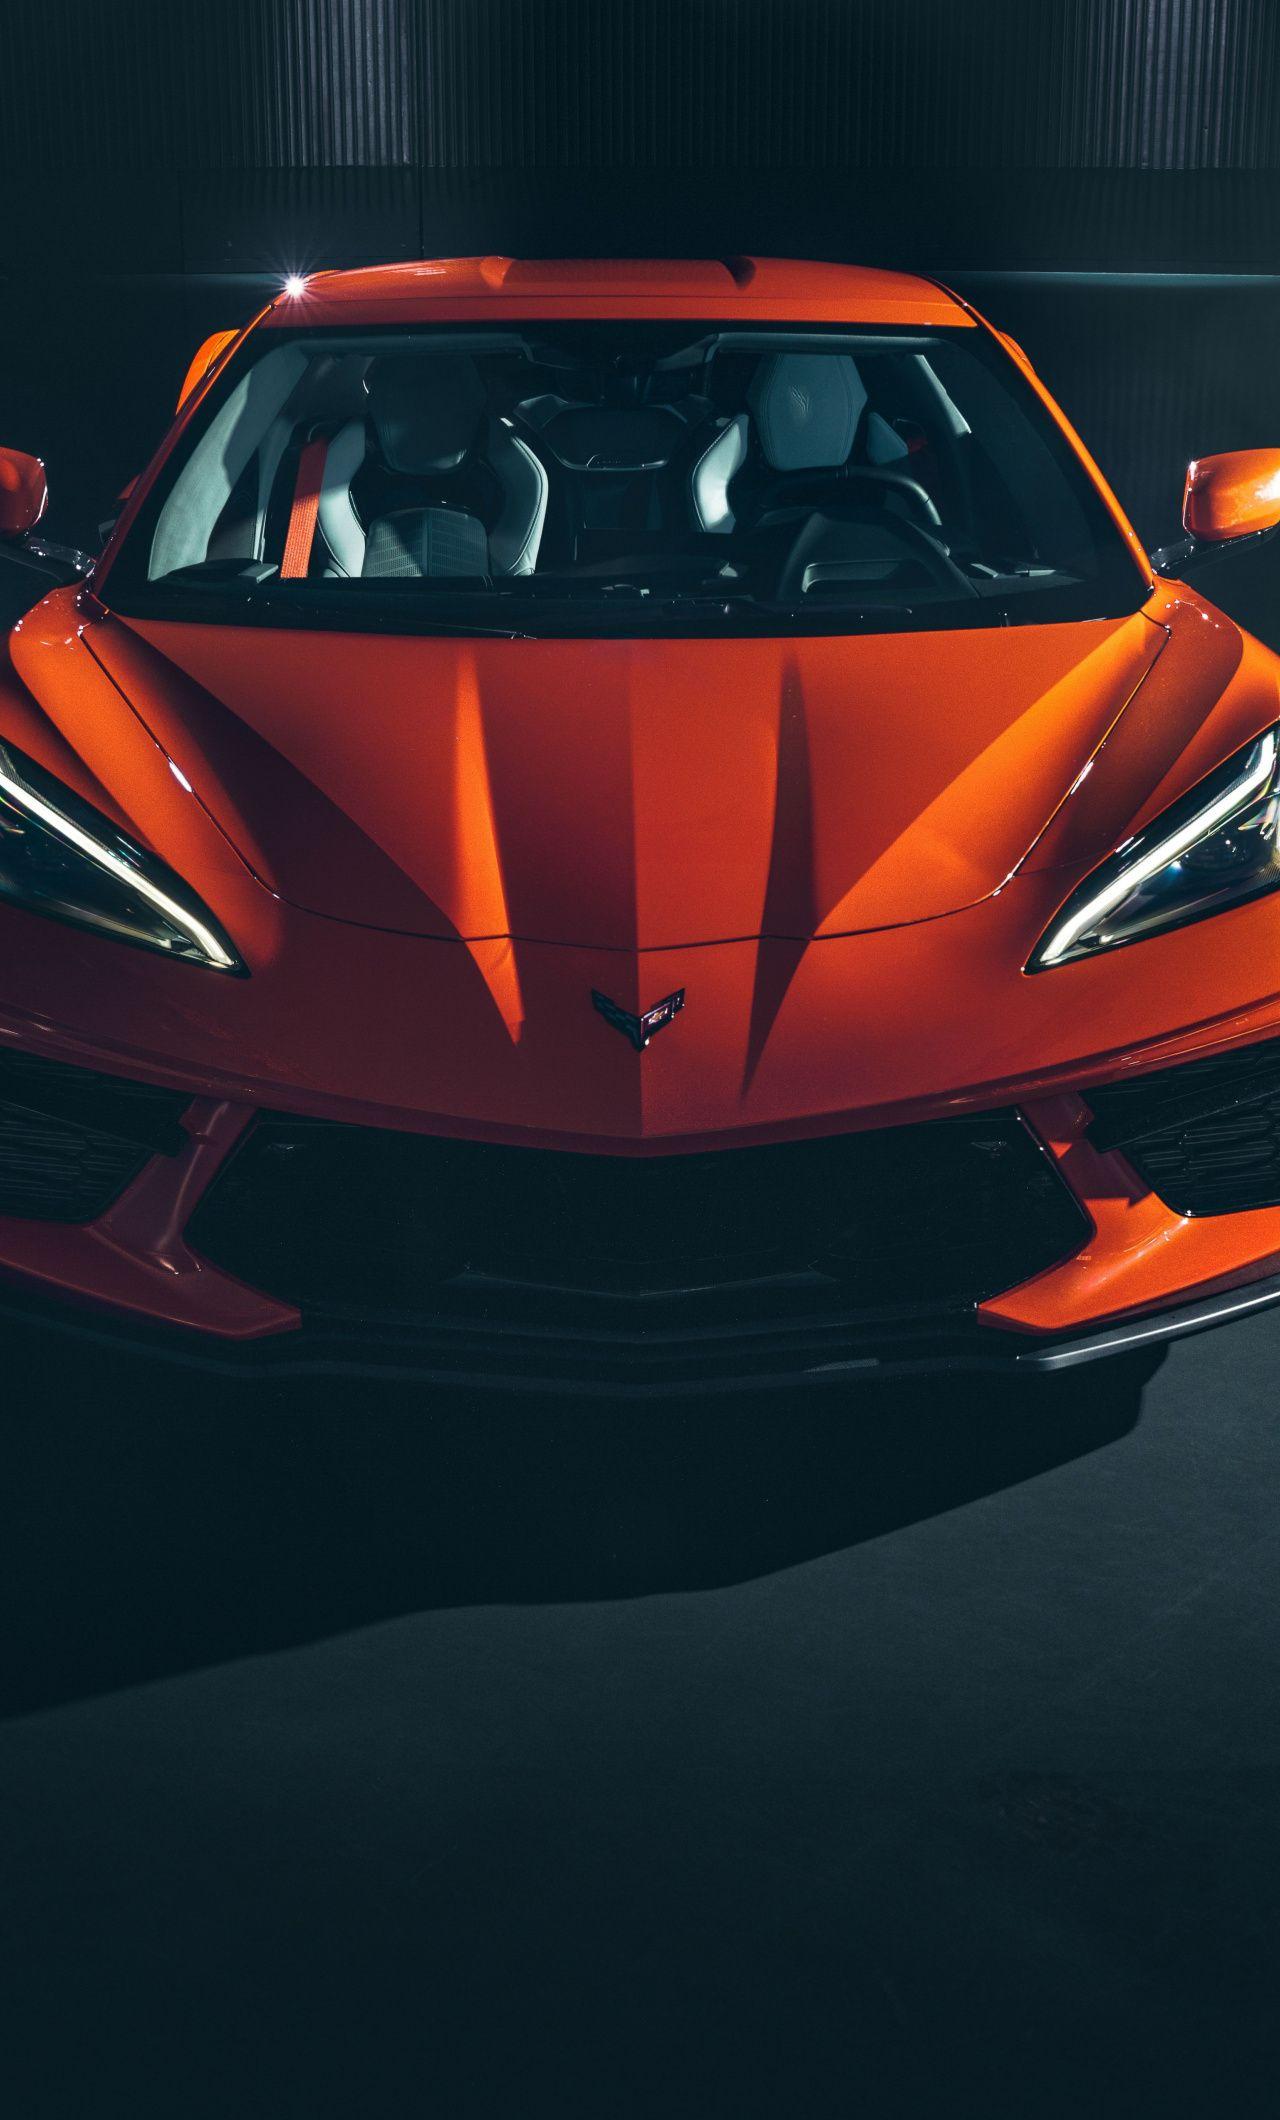 Download 1280x2120 wallpaper 2020 Chevrolet Corvette ...